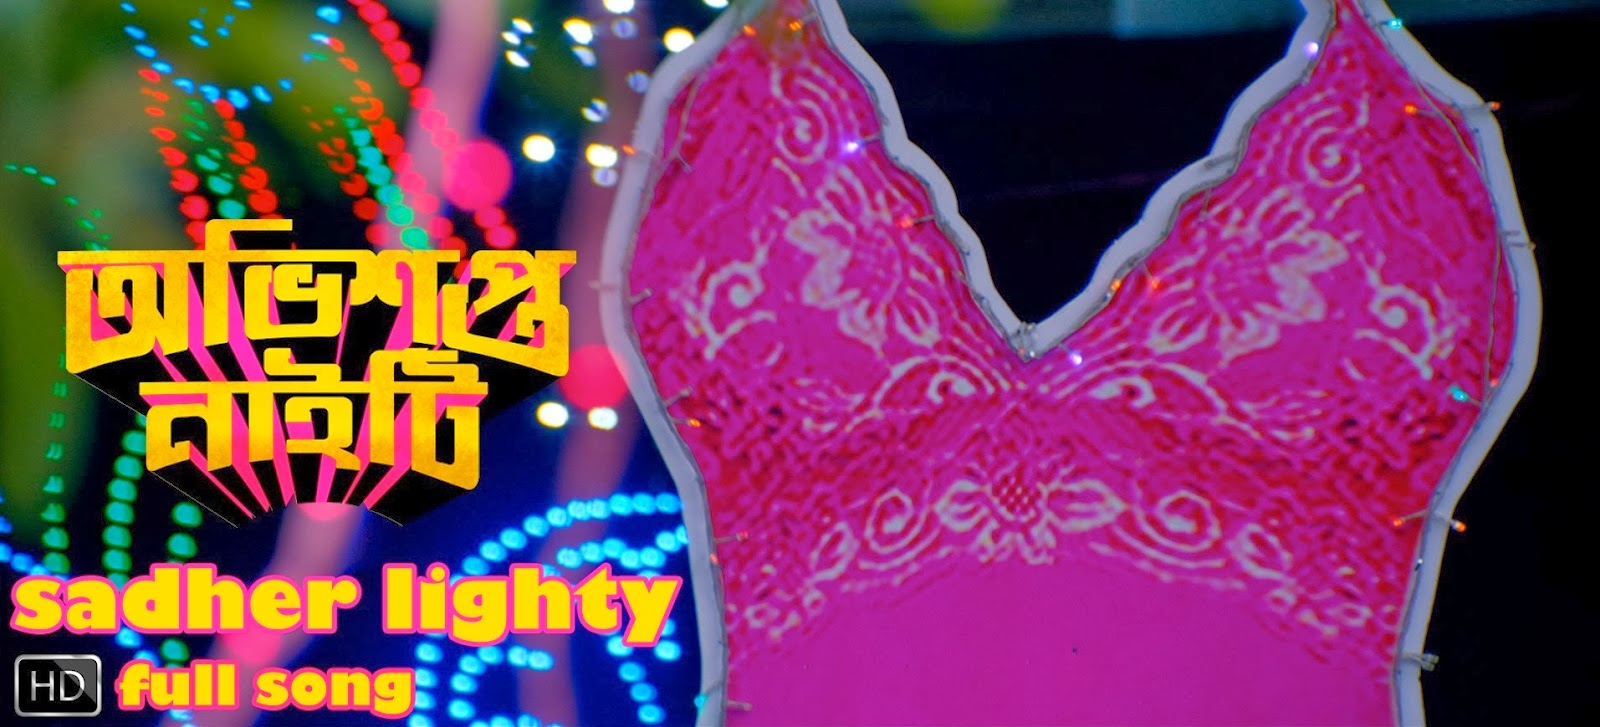 Sadher Lighty - Obhishopto Nighty (2014) Bengali HD Video Watch Online